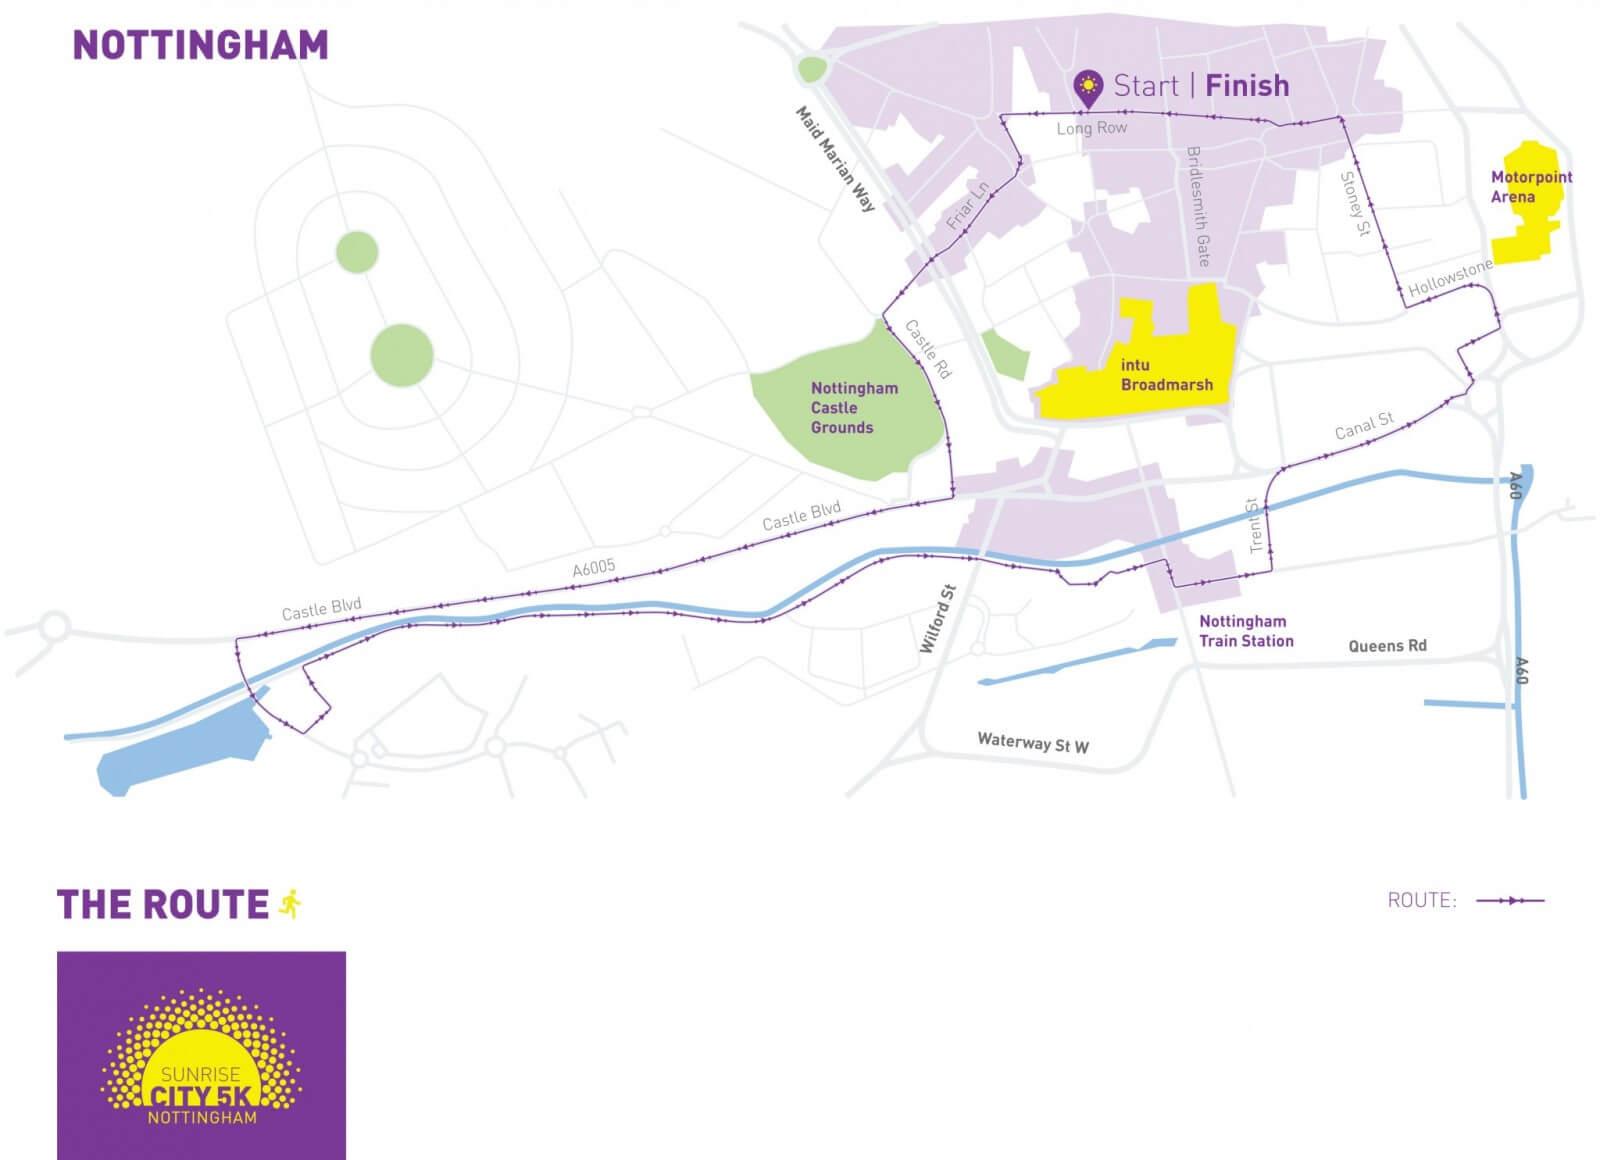 Map Of Uk Nottingham.Nottingham Sunrise City 5k